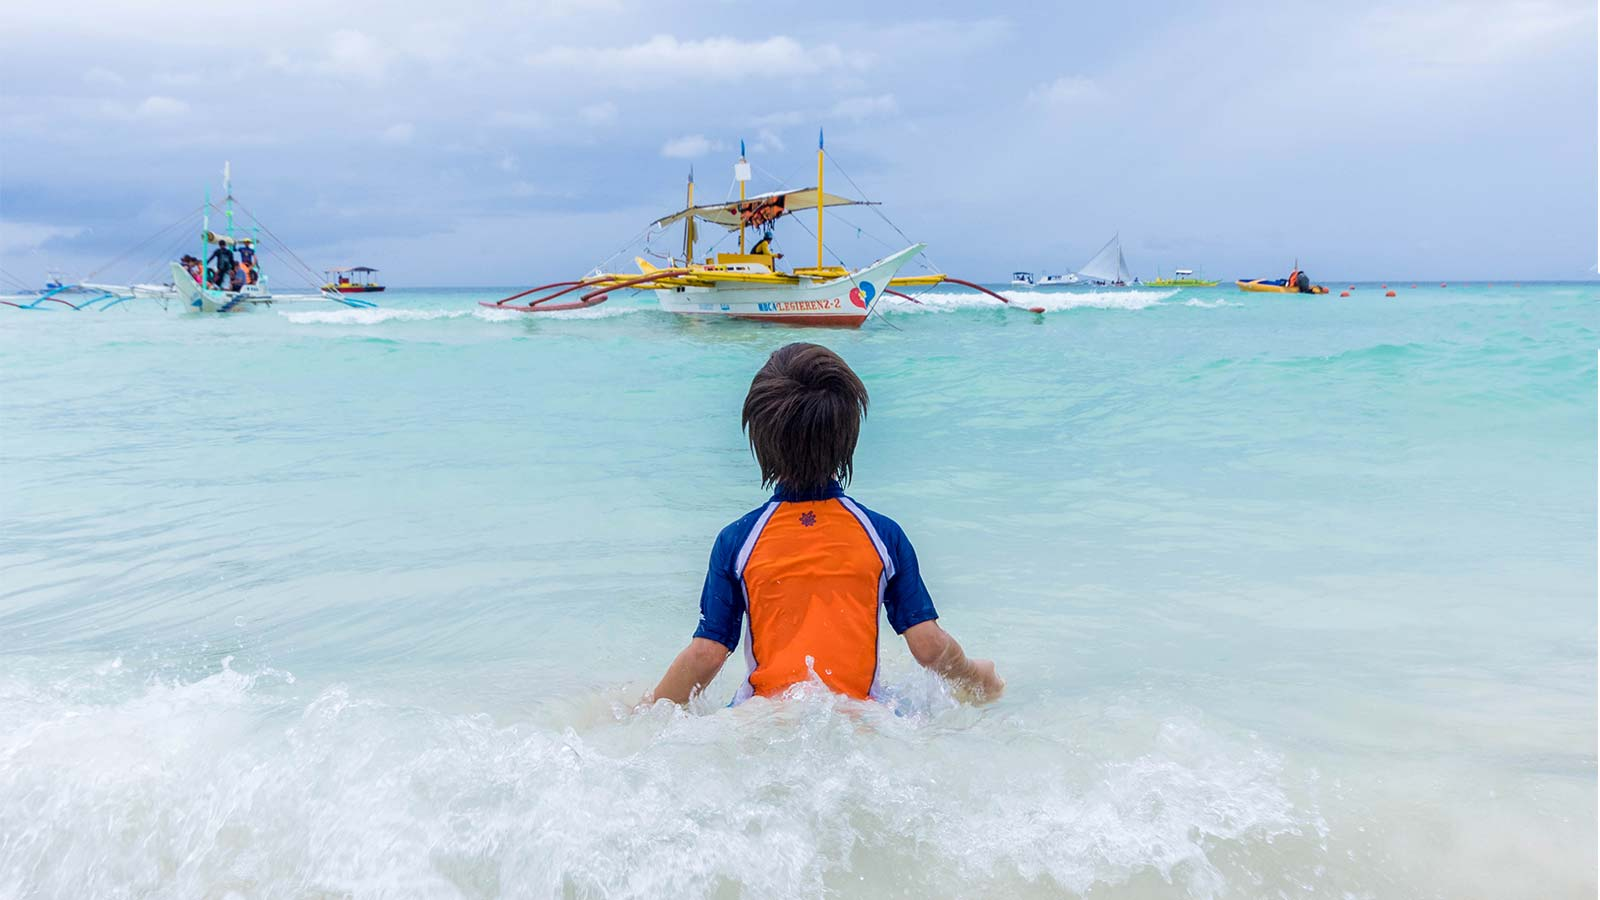 A young boy plays in the surf on Boracay Beach